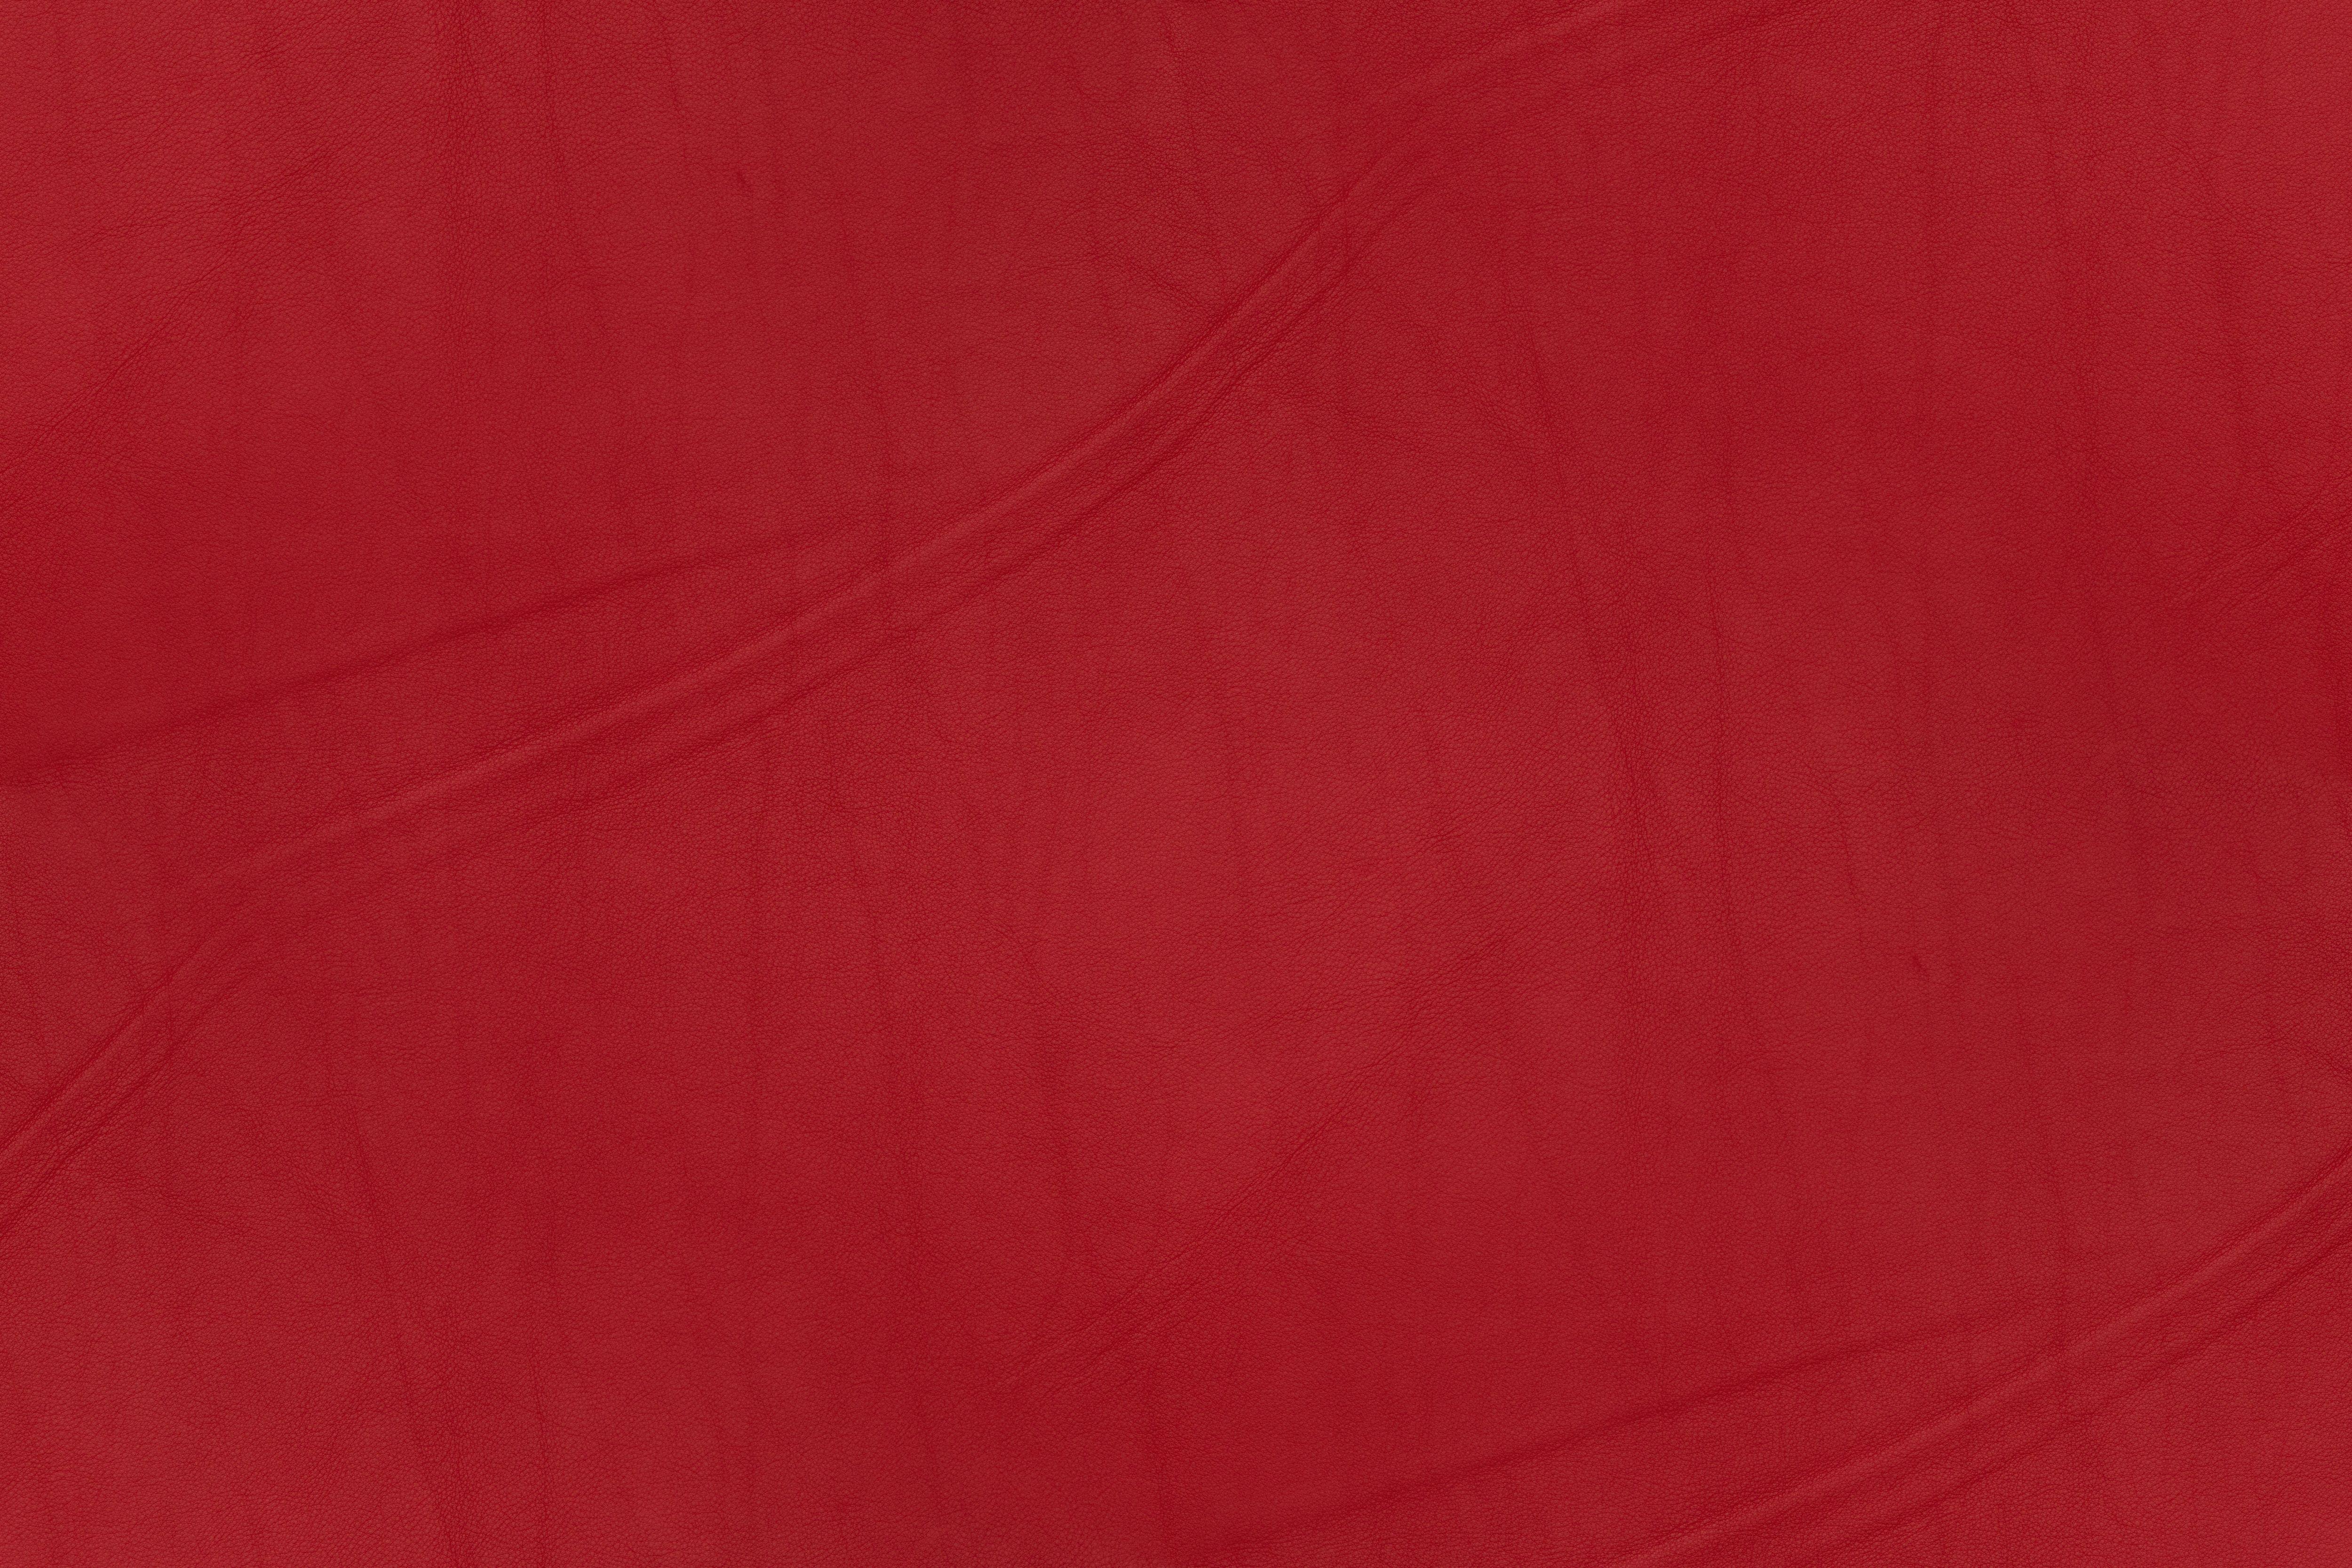 fd8f29c3848 red